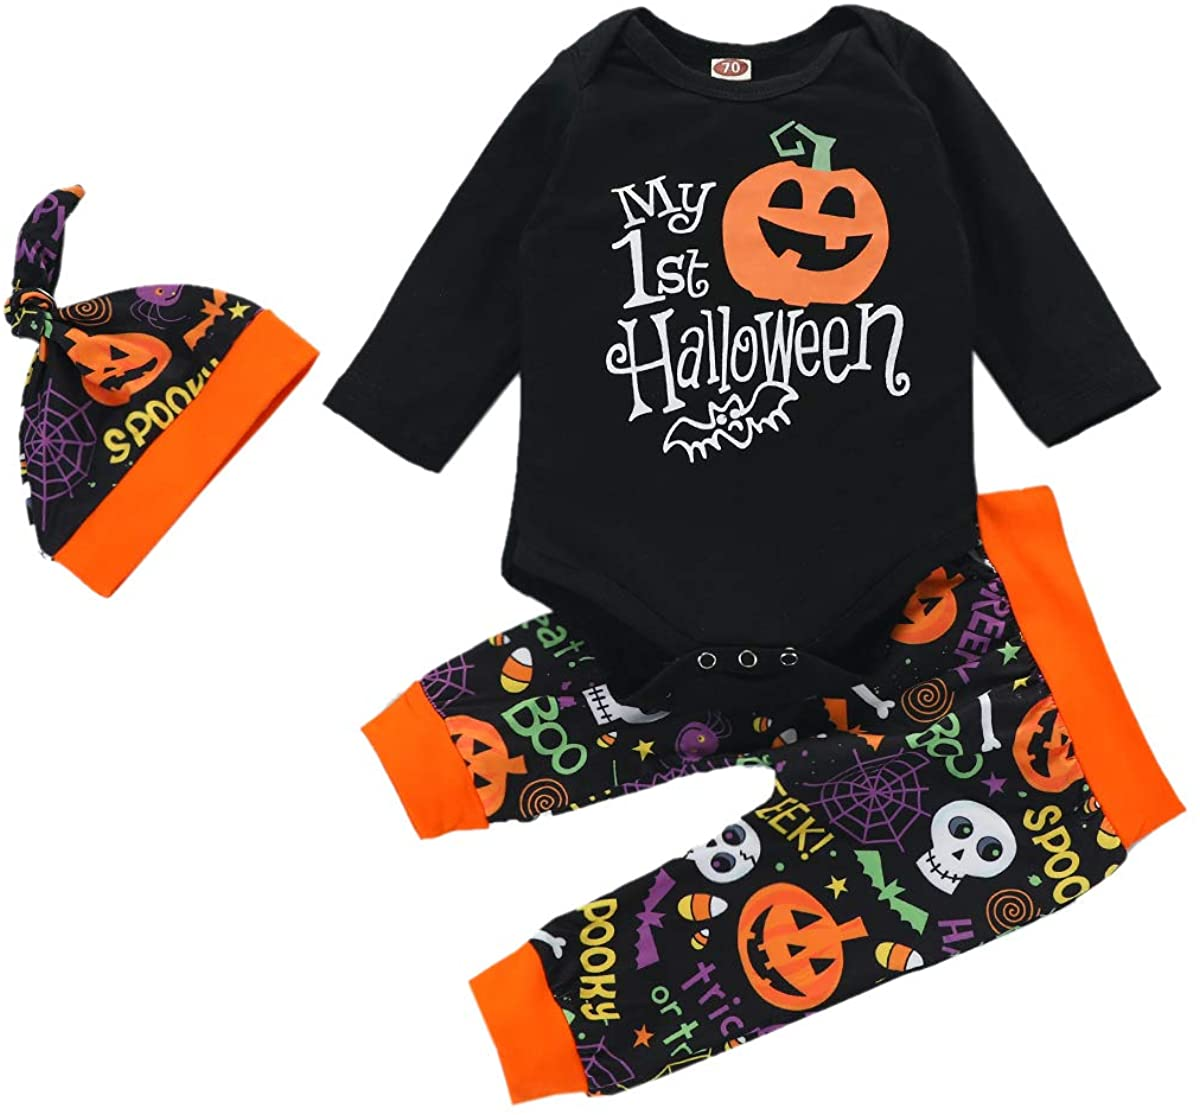 Newborn Baby Boys Girls Halloween Outfit Ghost Romper Bodysuit Skull Pants Hat Clothes Set My 1st Halloween Pajama 0-24M